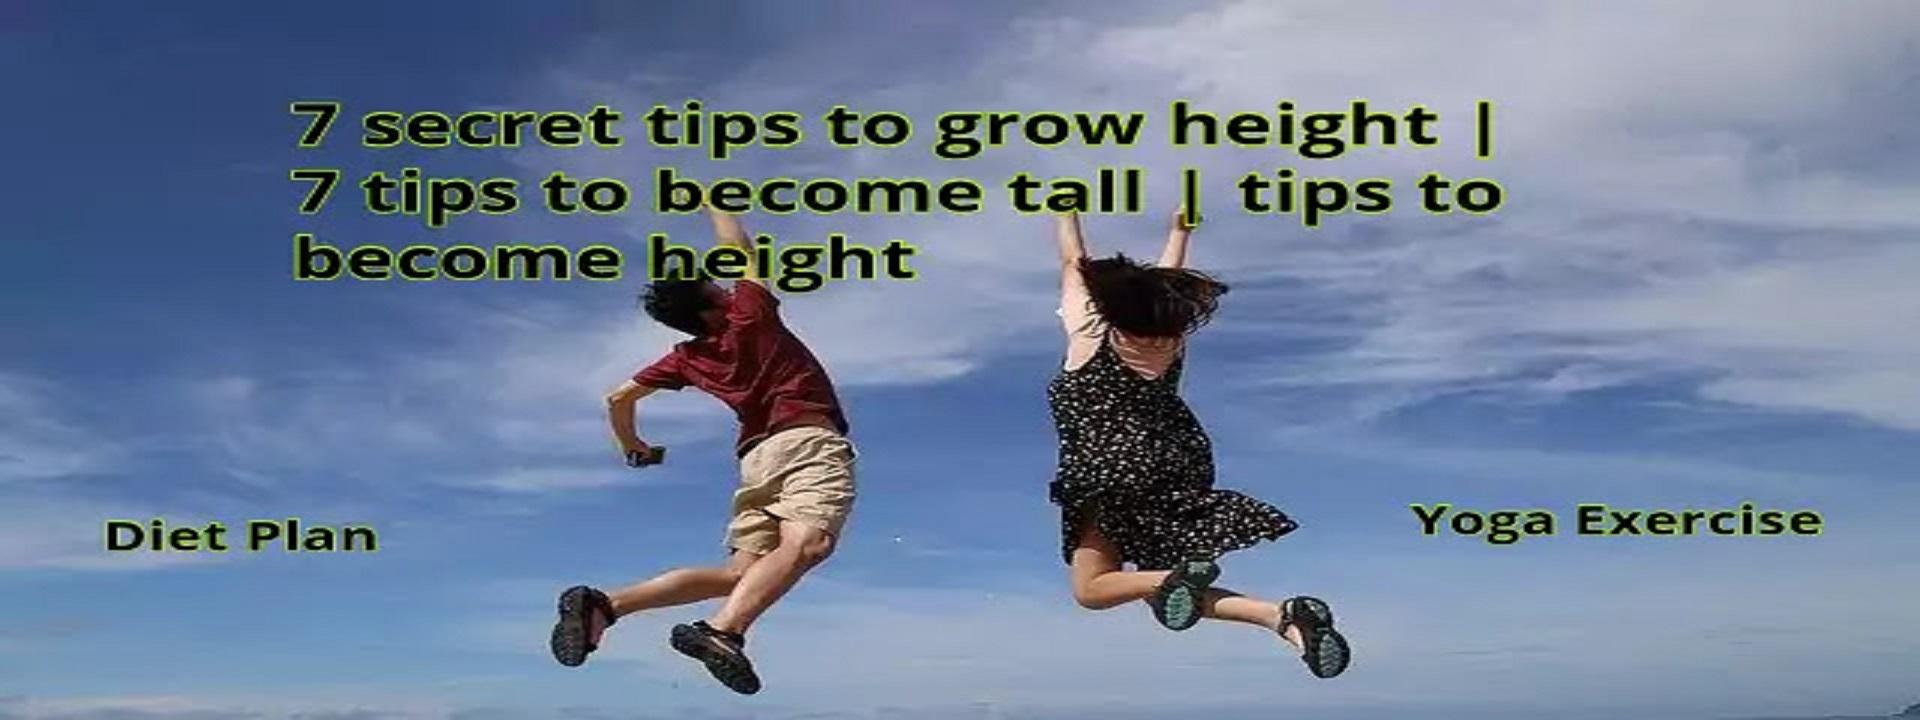 7 secret tips to grow height